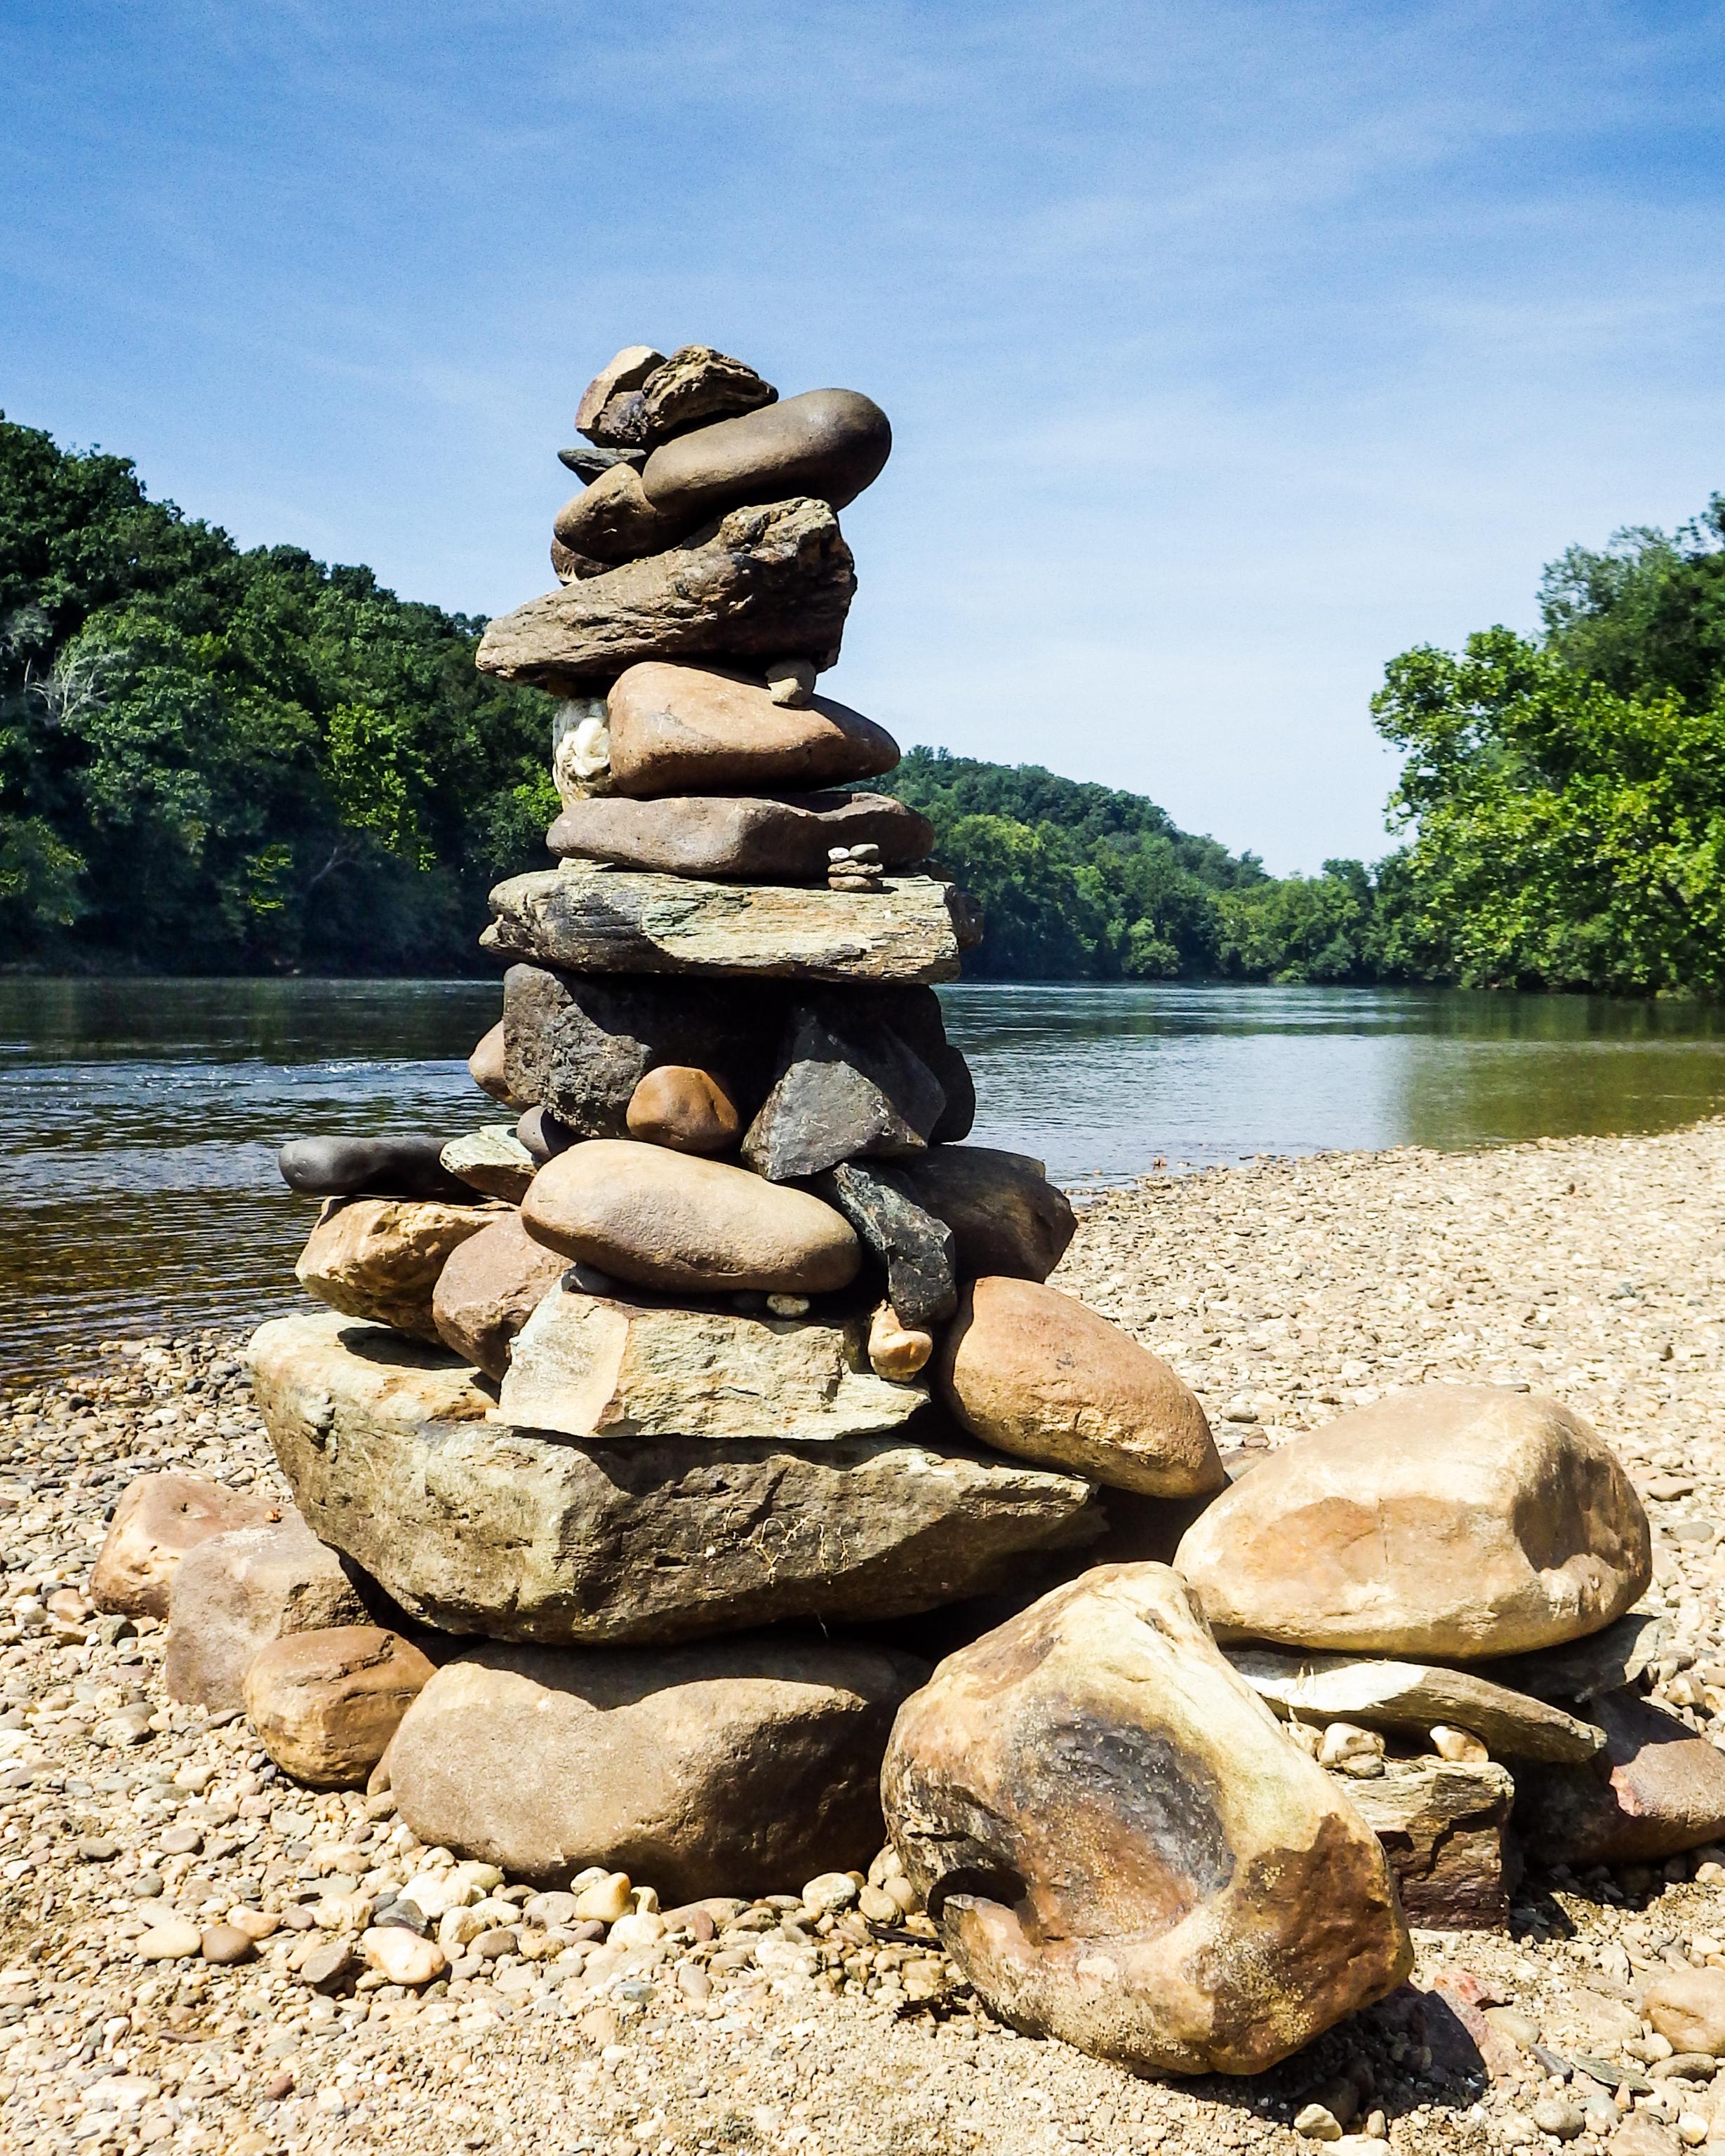 James River near Scottsville Virginia. ©2016 Images by Design